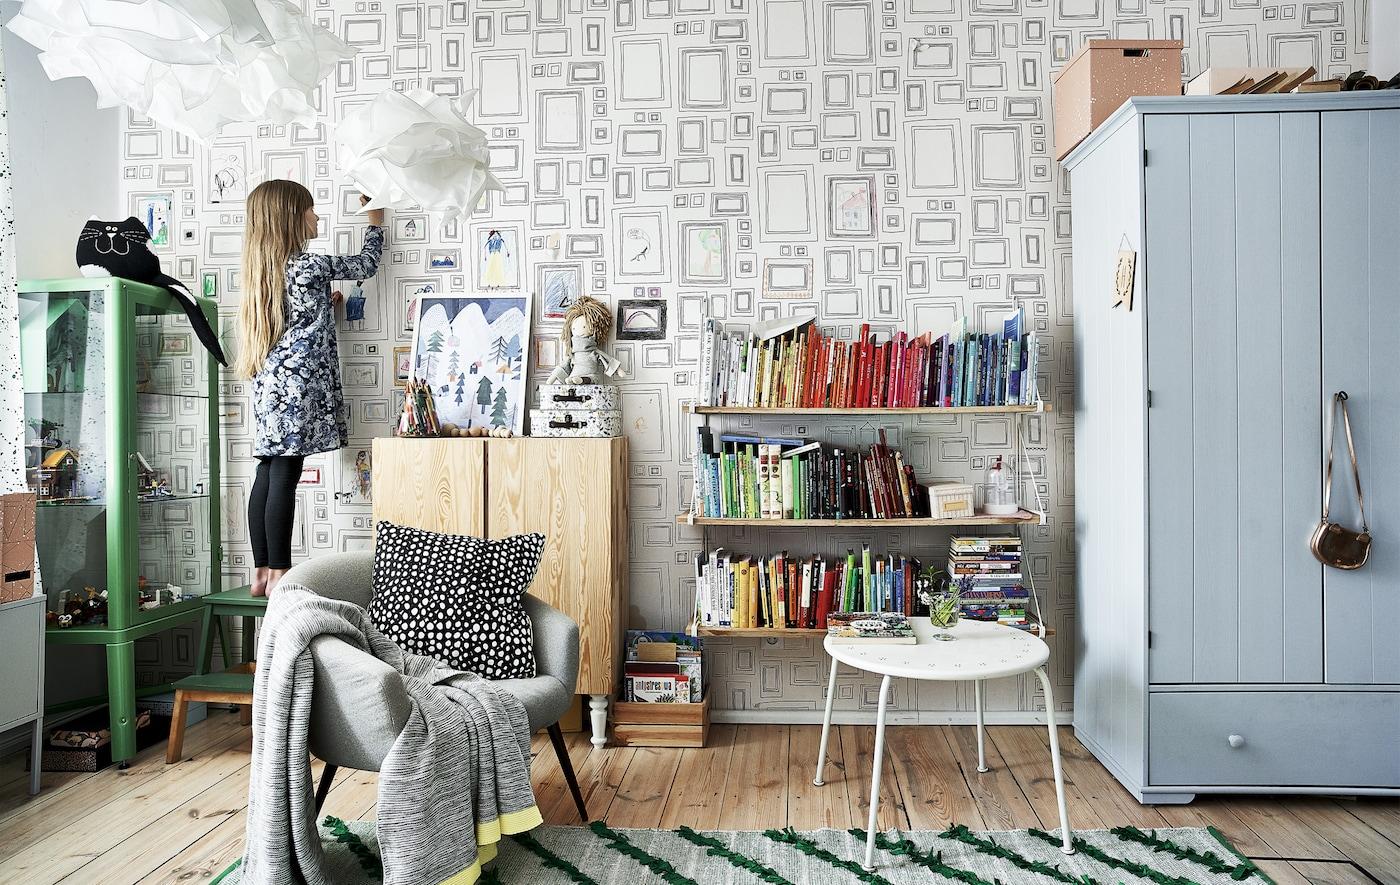 Kids Bedroom Décor Ideas For Girls and Boys  IKEA Australia - IKEA